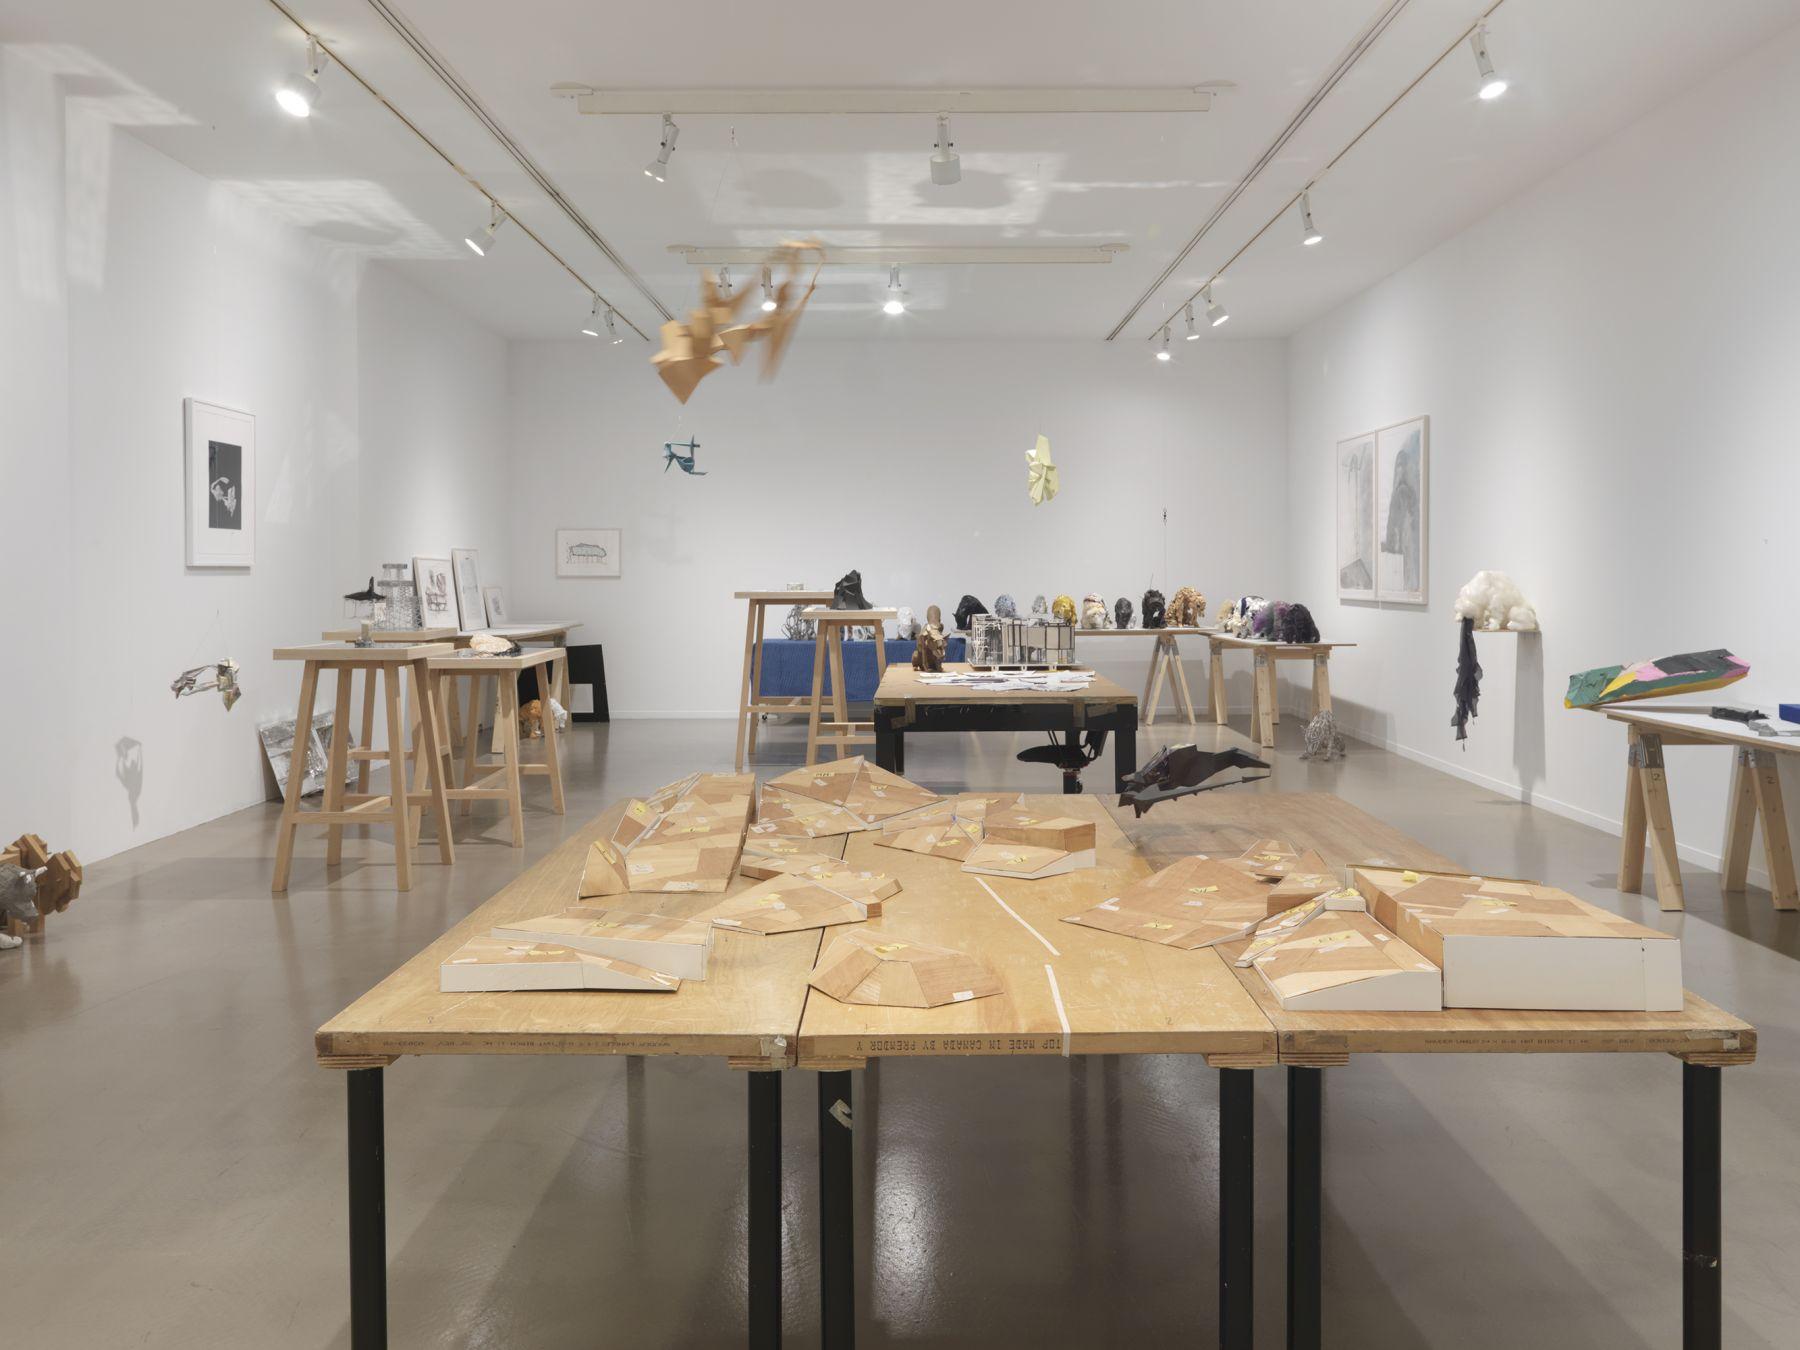 Lee Bul Installation view